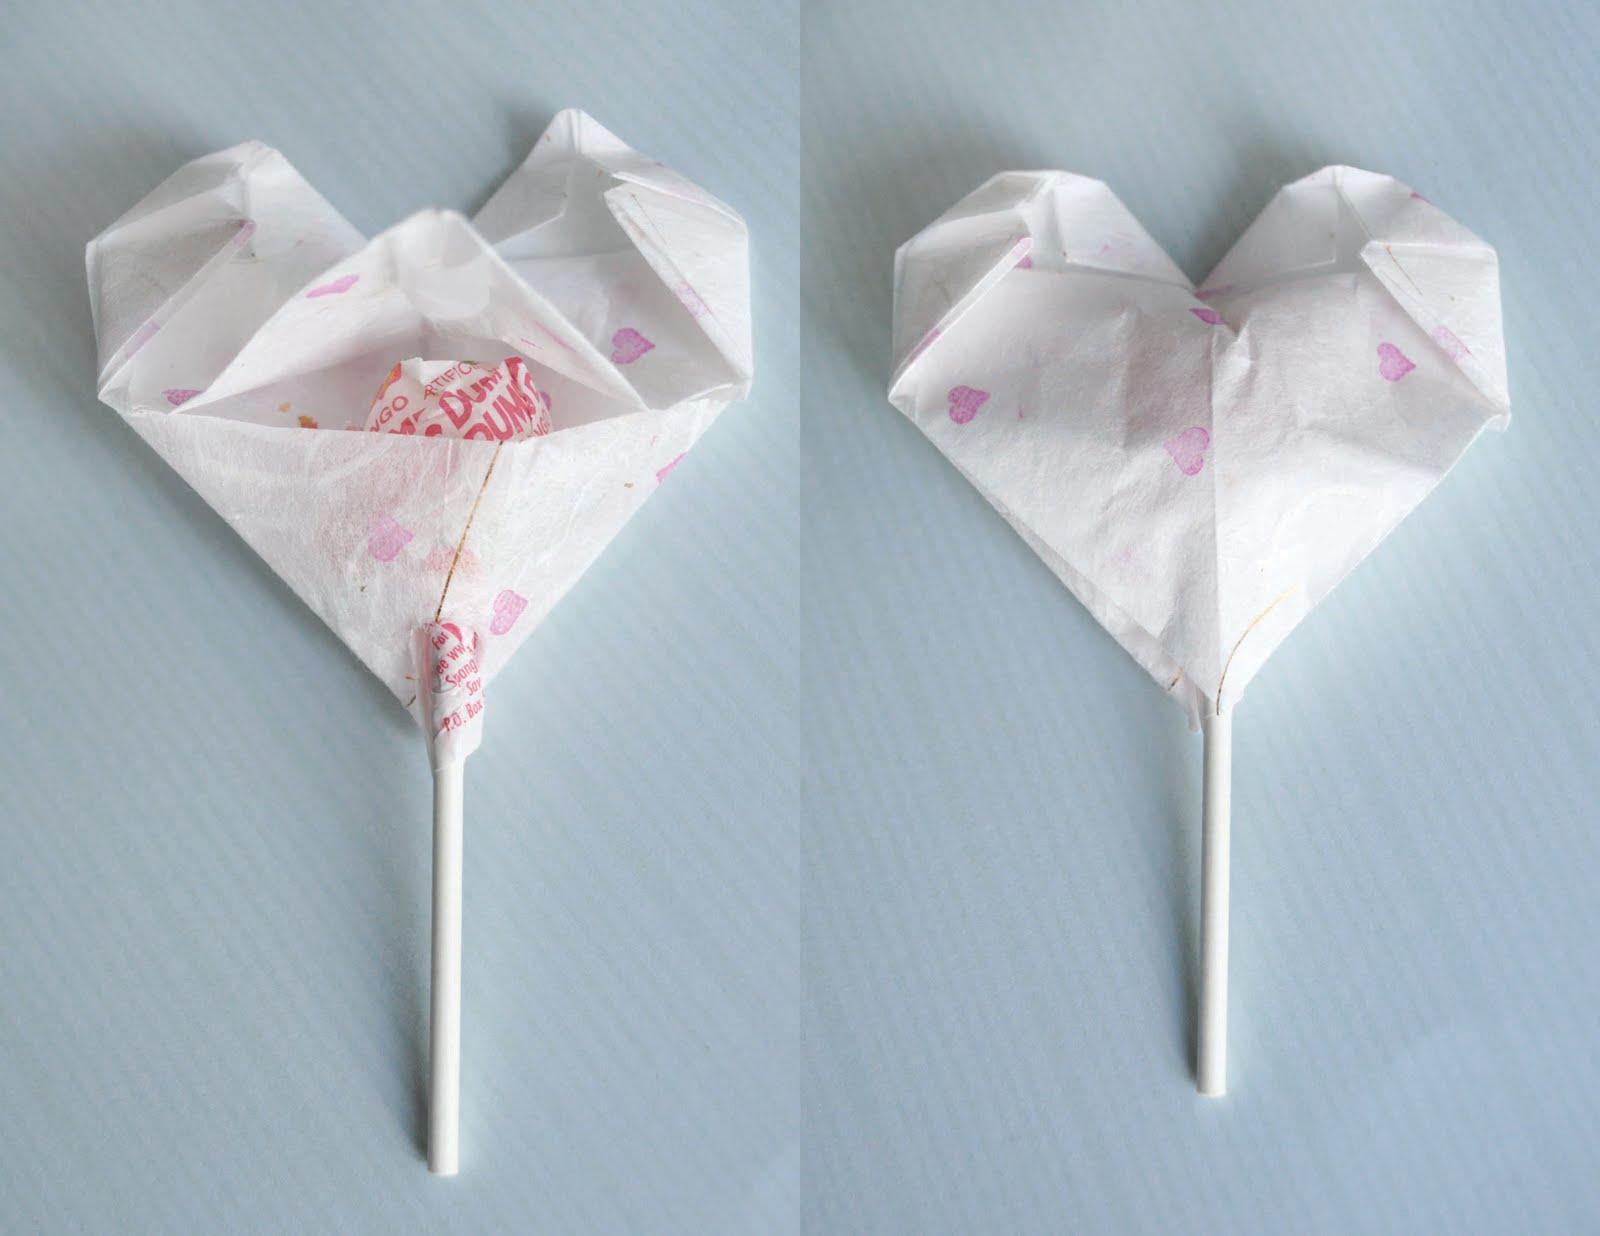 zakka life: Craft: Origami Heart Valentines - photo#26